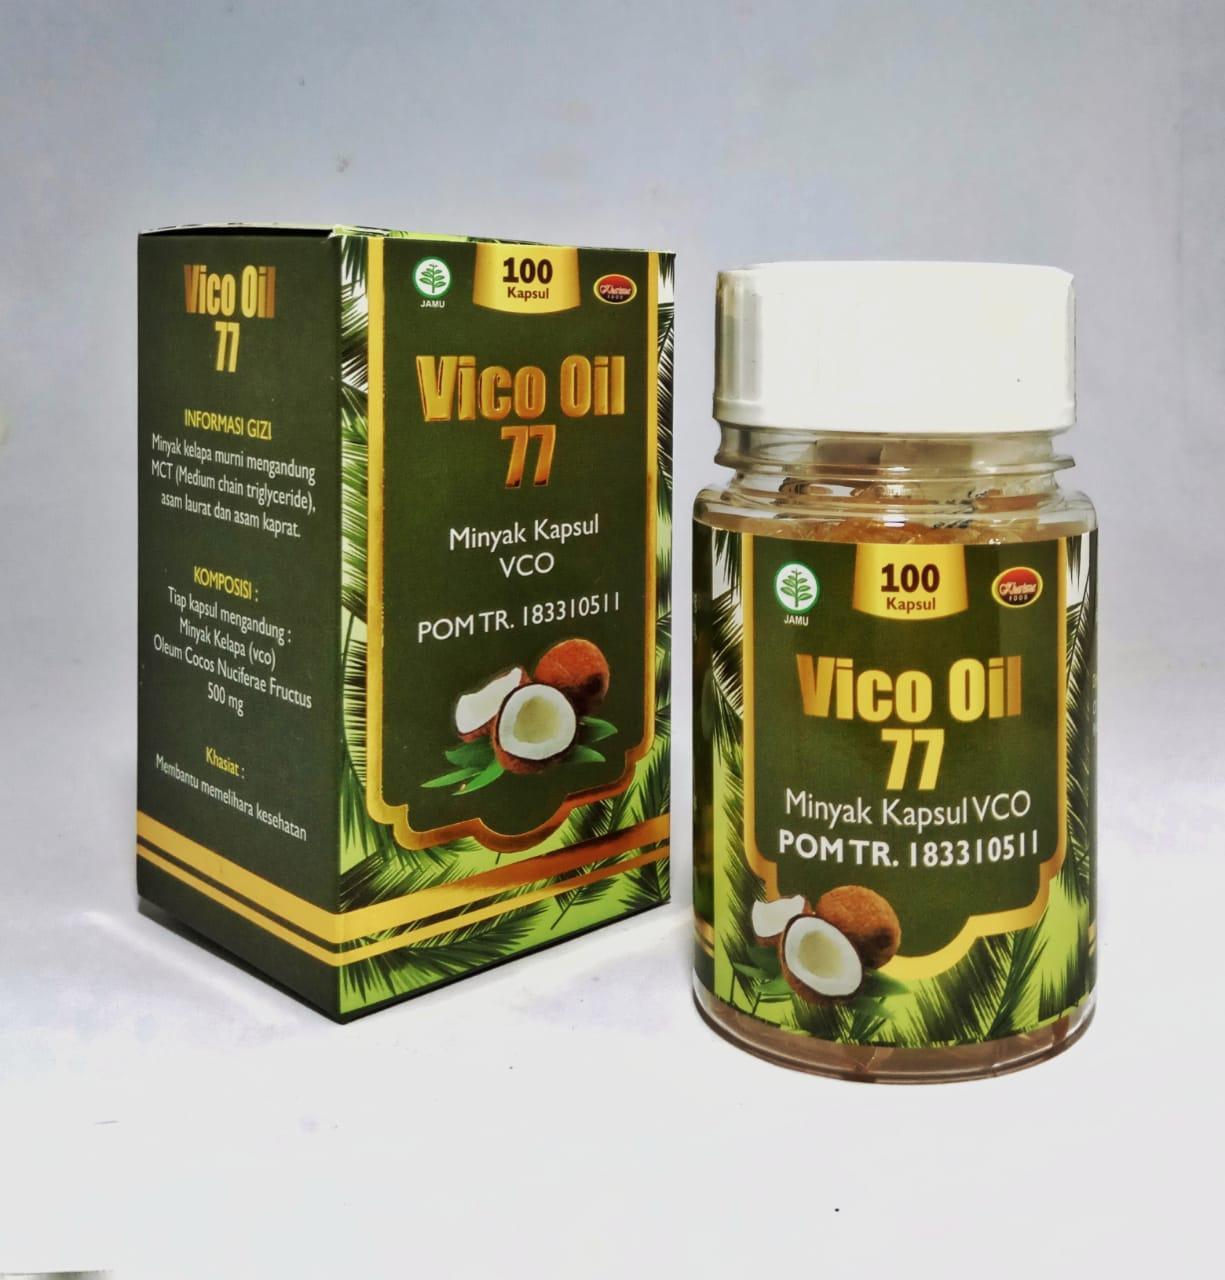 VICO OIL 77 VCO Virgin Coconut Oil Minyak Kelapa 100 Kapsul Kharisma